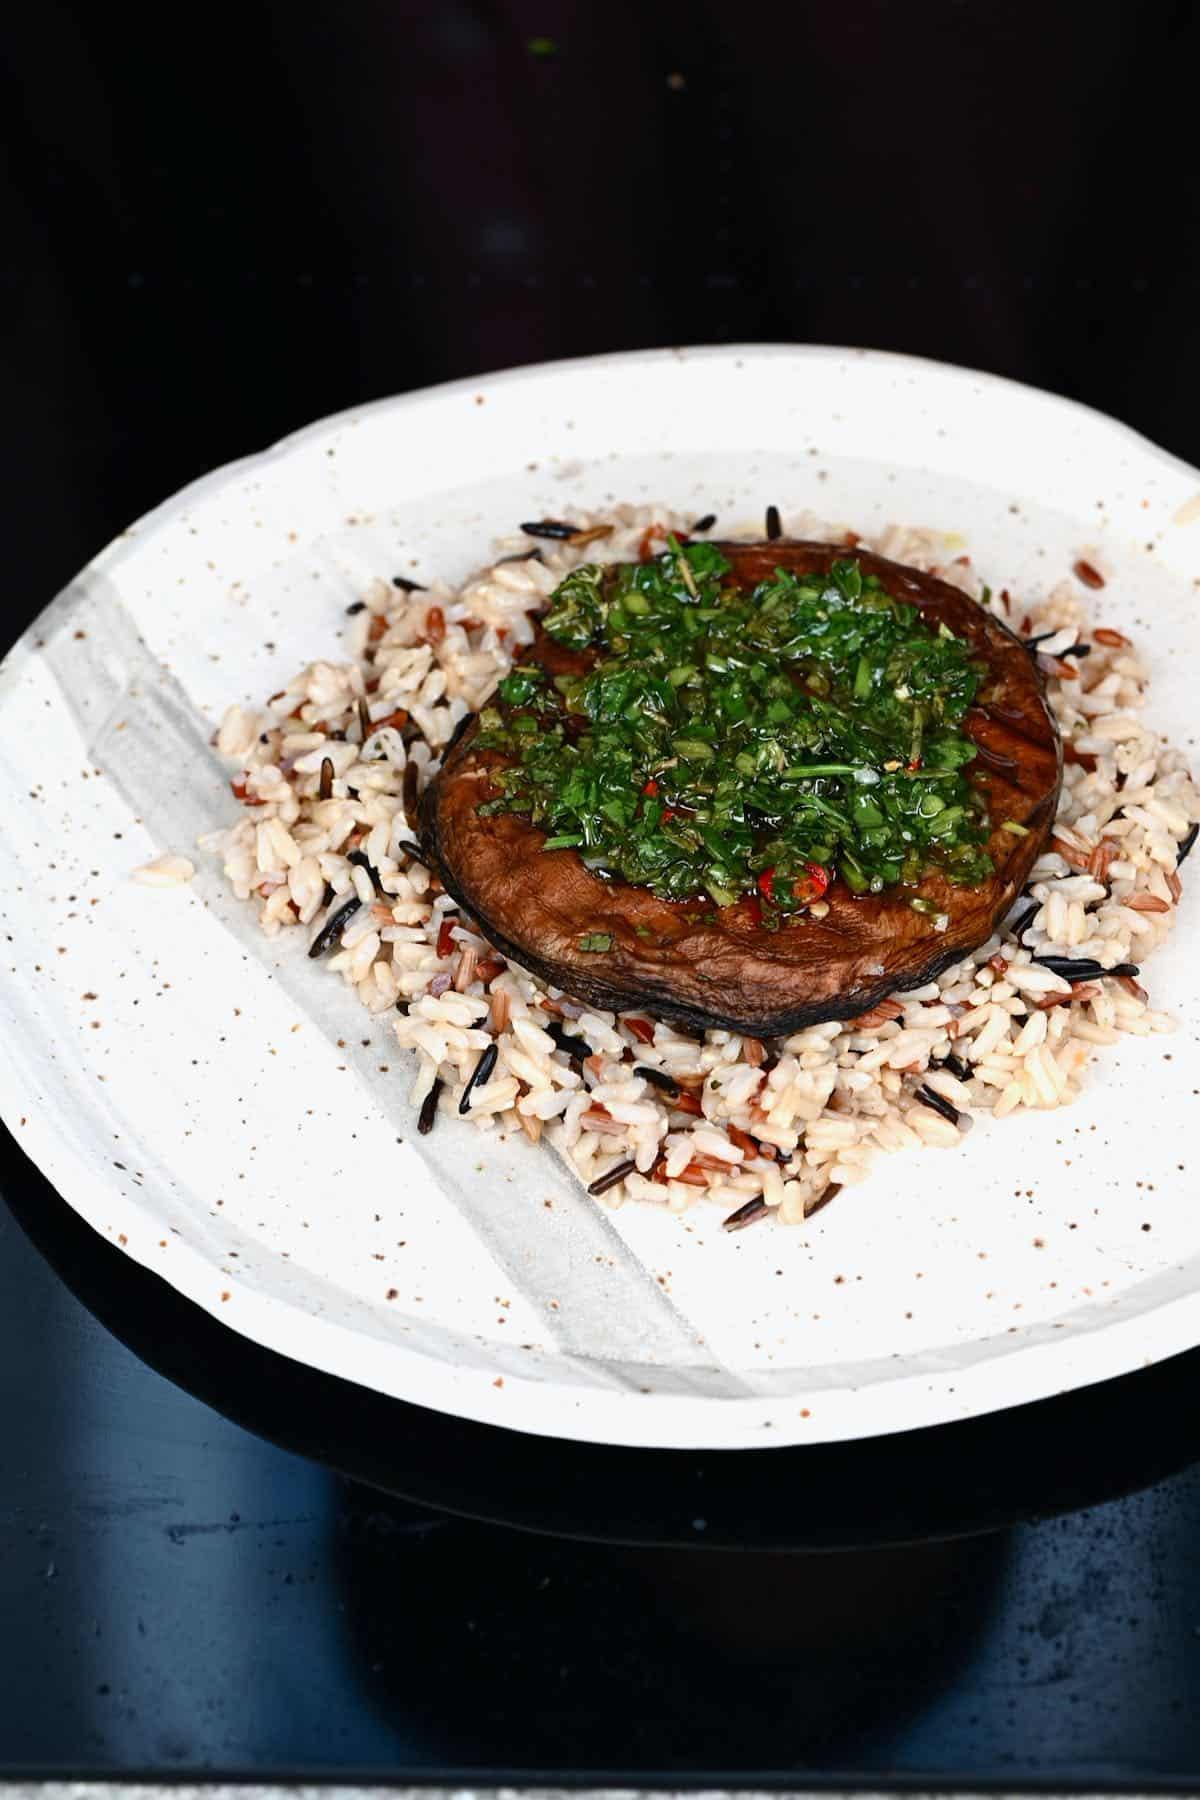 Rice mushroom and chimichurri